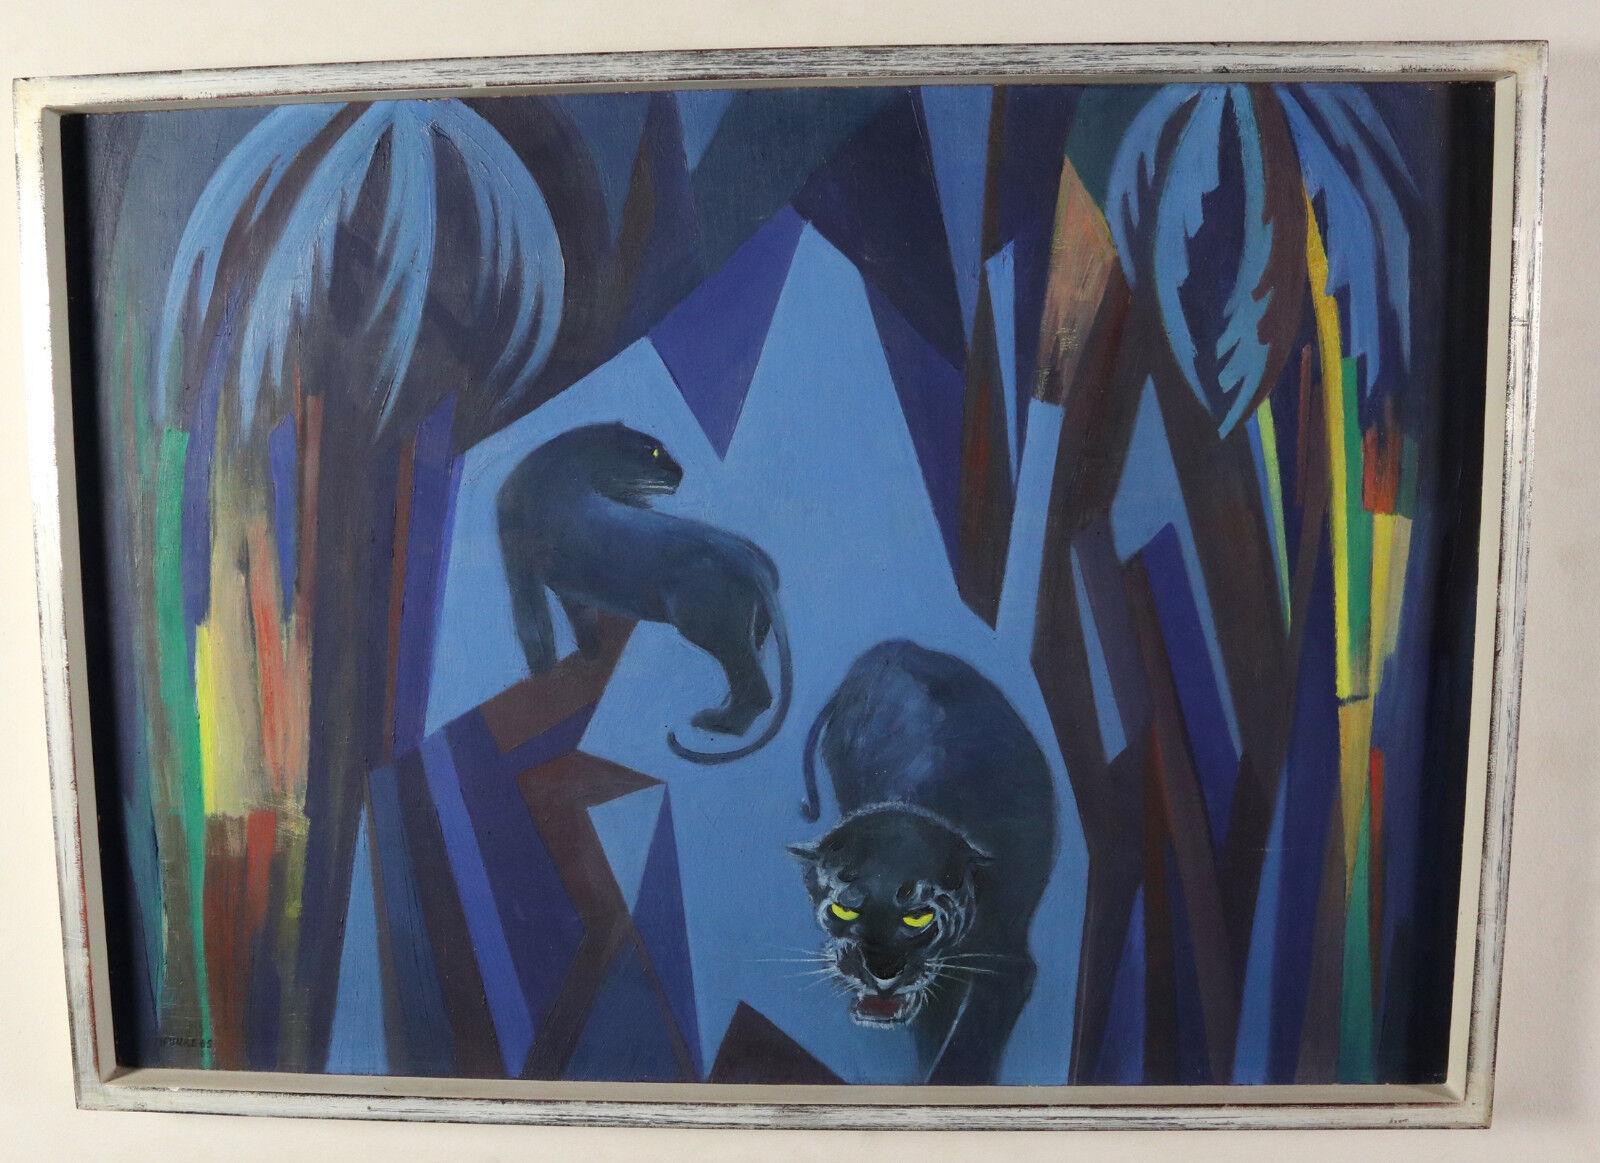 Scintilla OLIO OLIO OLIO DIPINTO 1965 Panther astratto blu foresta vergine giungla Panthers 89x69cm 1bb176